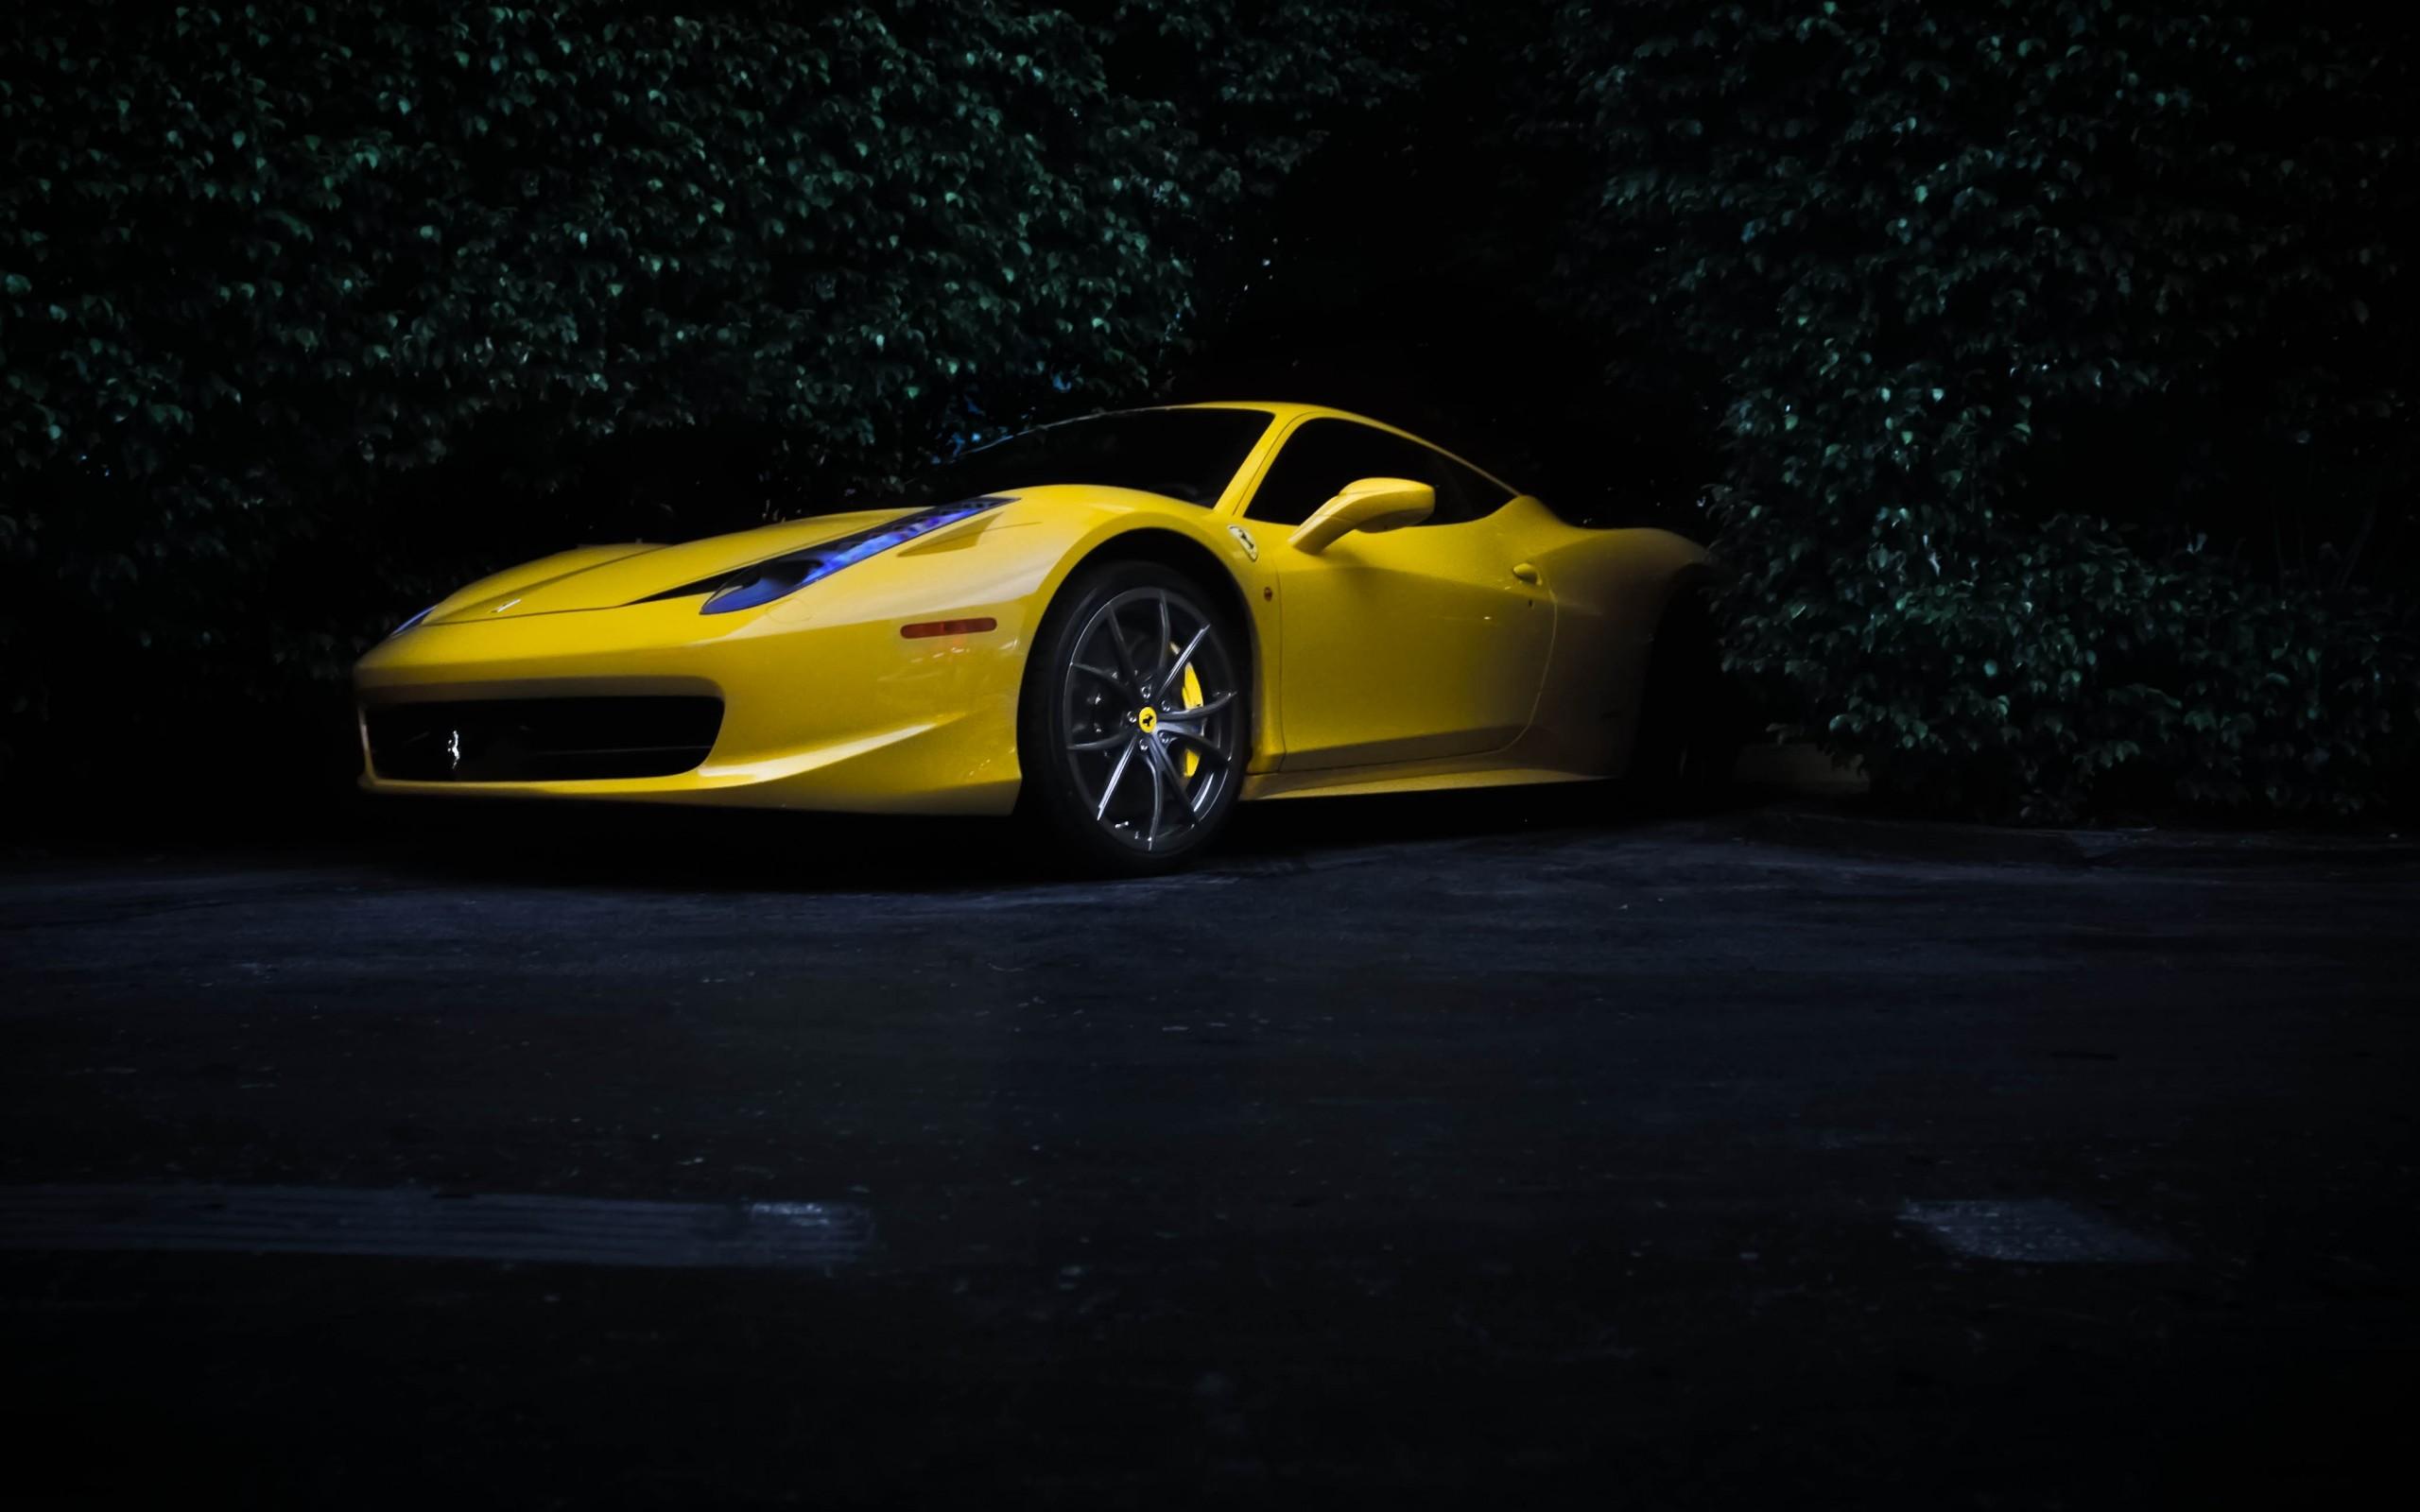 Cool Yellow Ferrari Wallpaper 36212